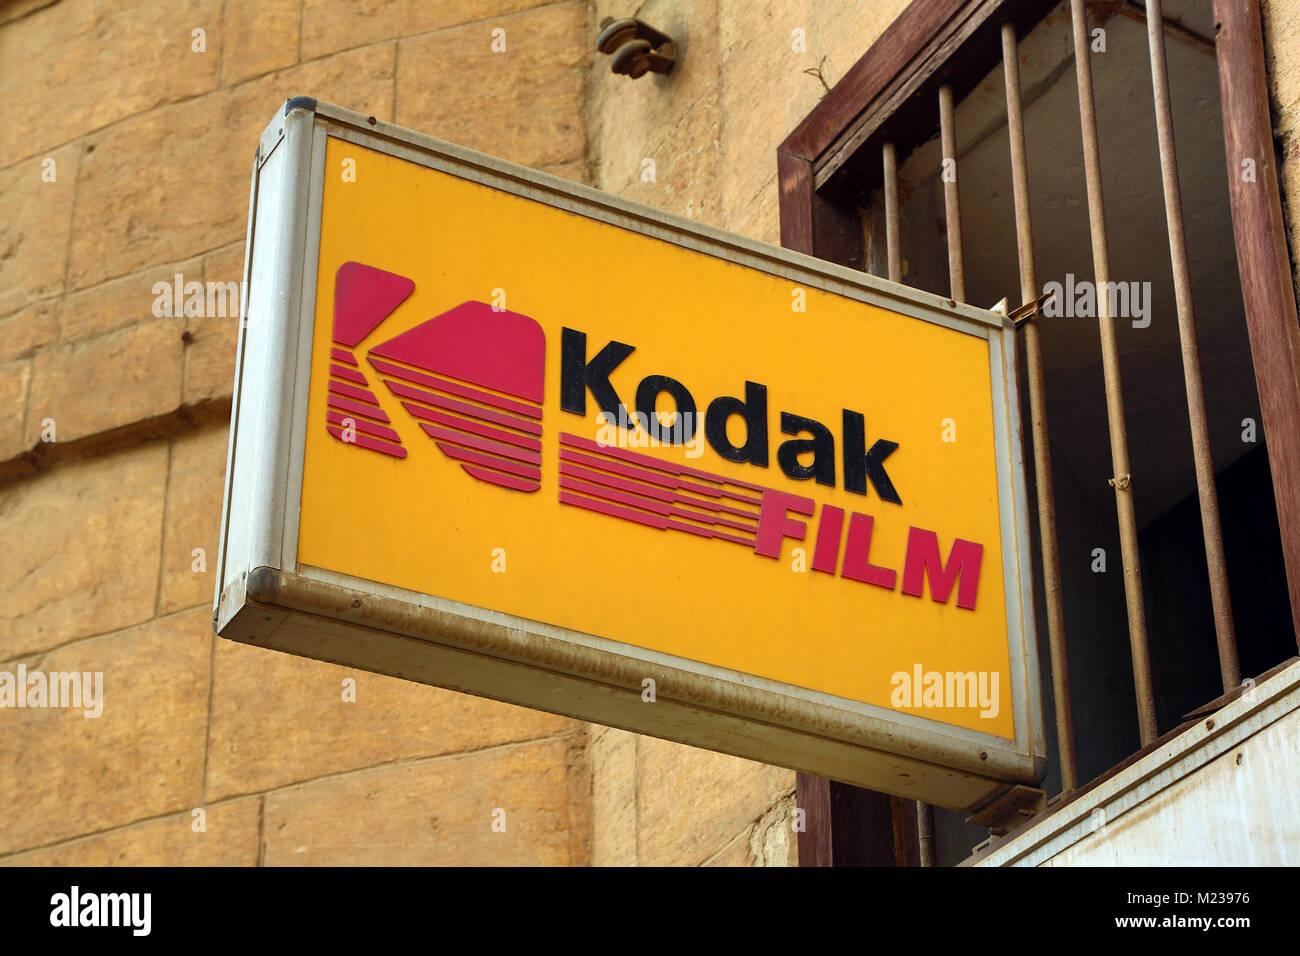 kodak film advertising egypt sign cairo alamy